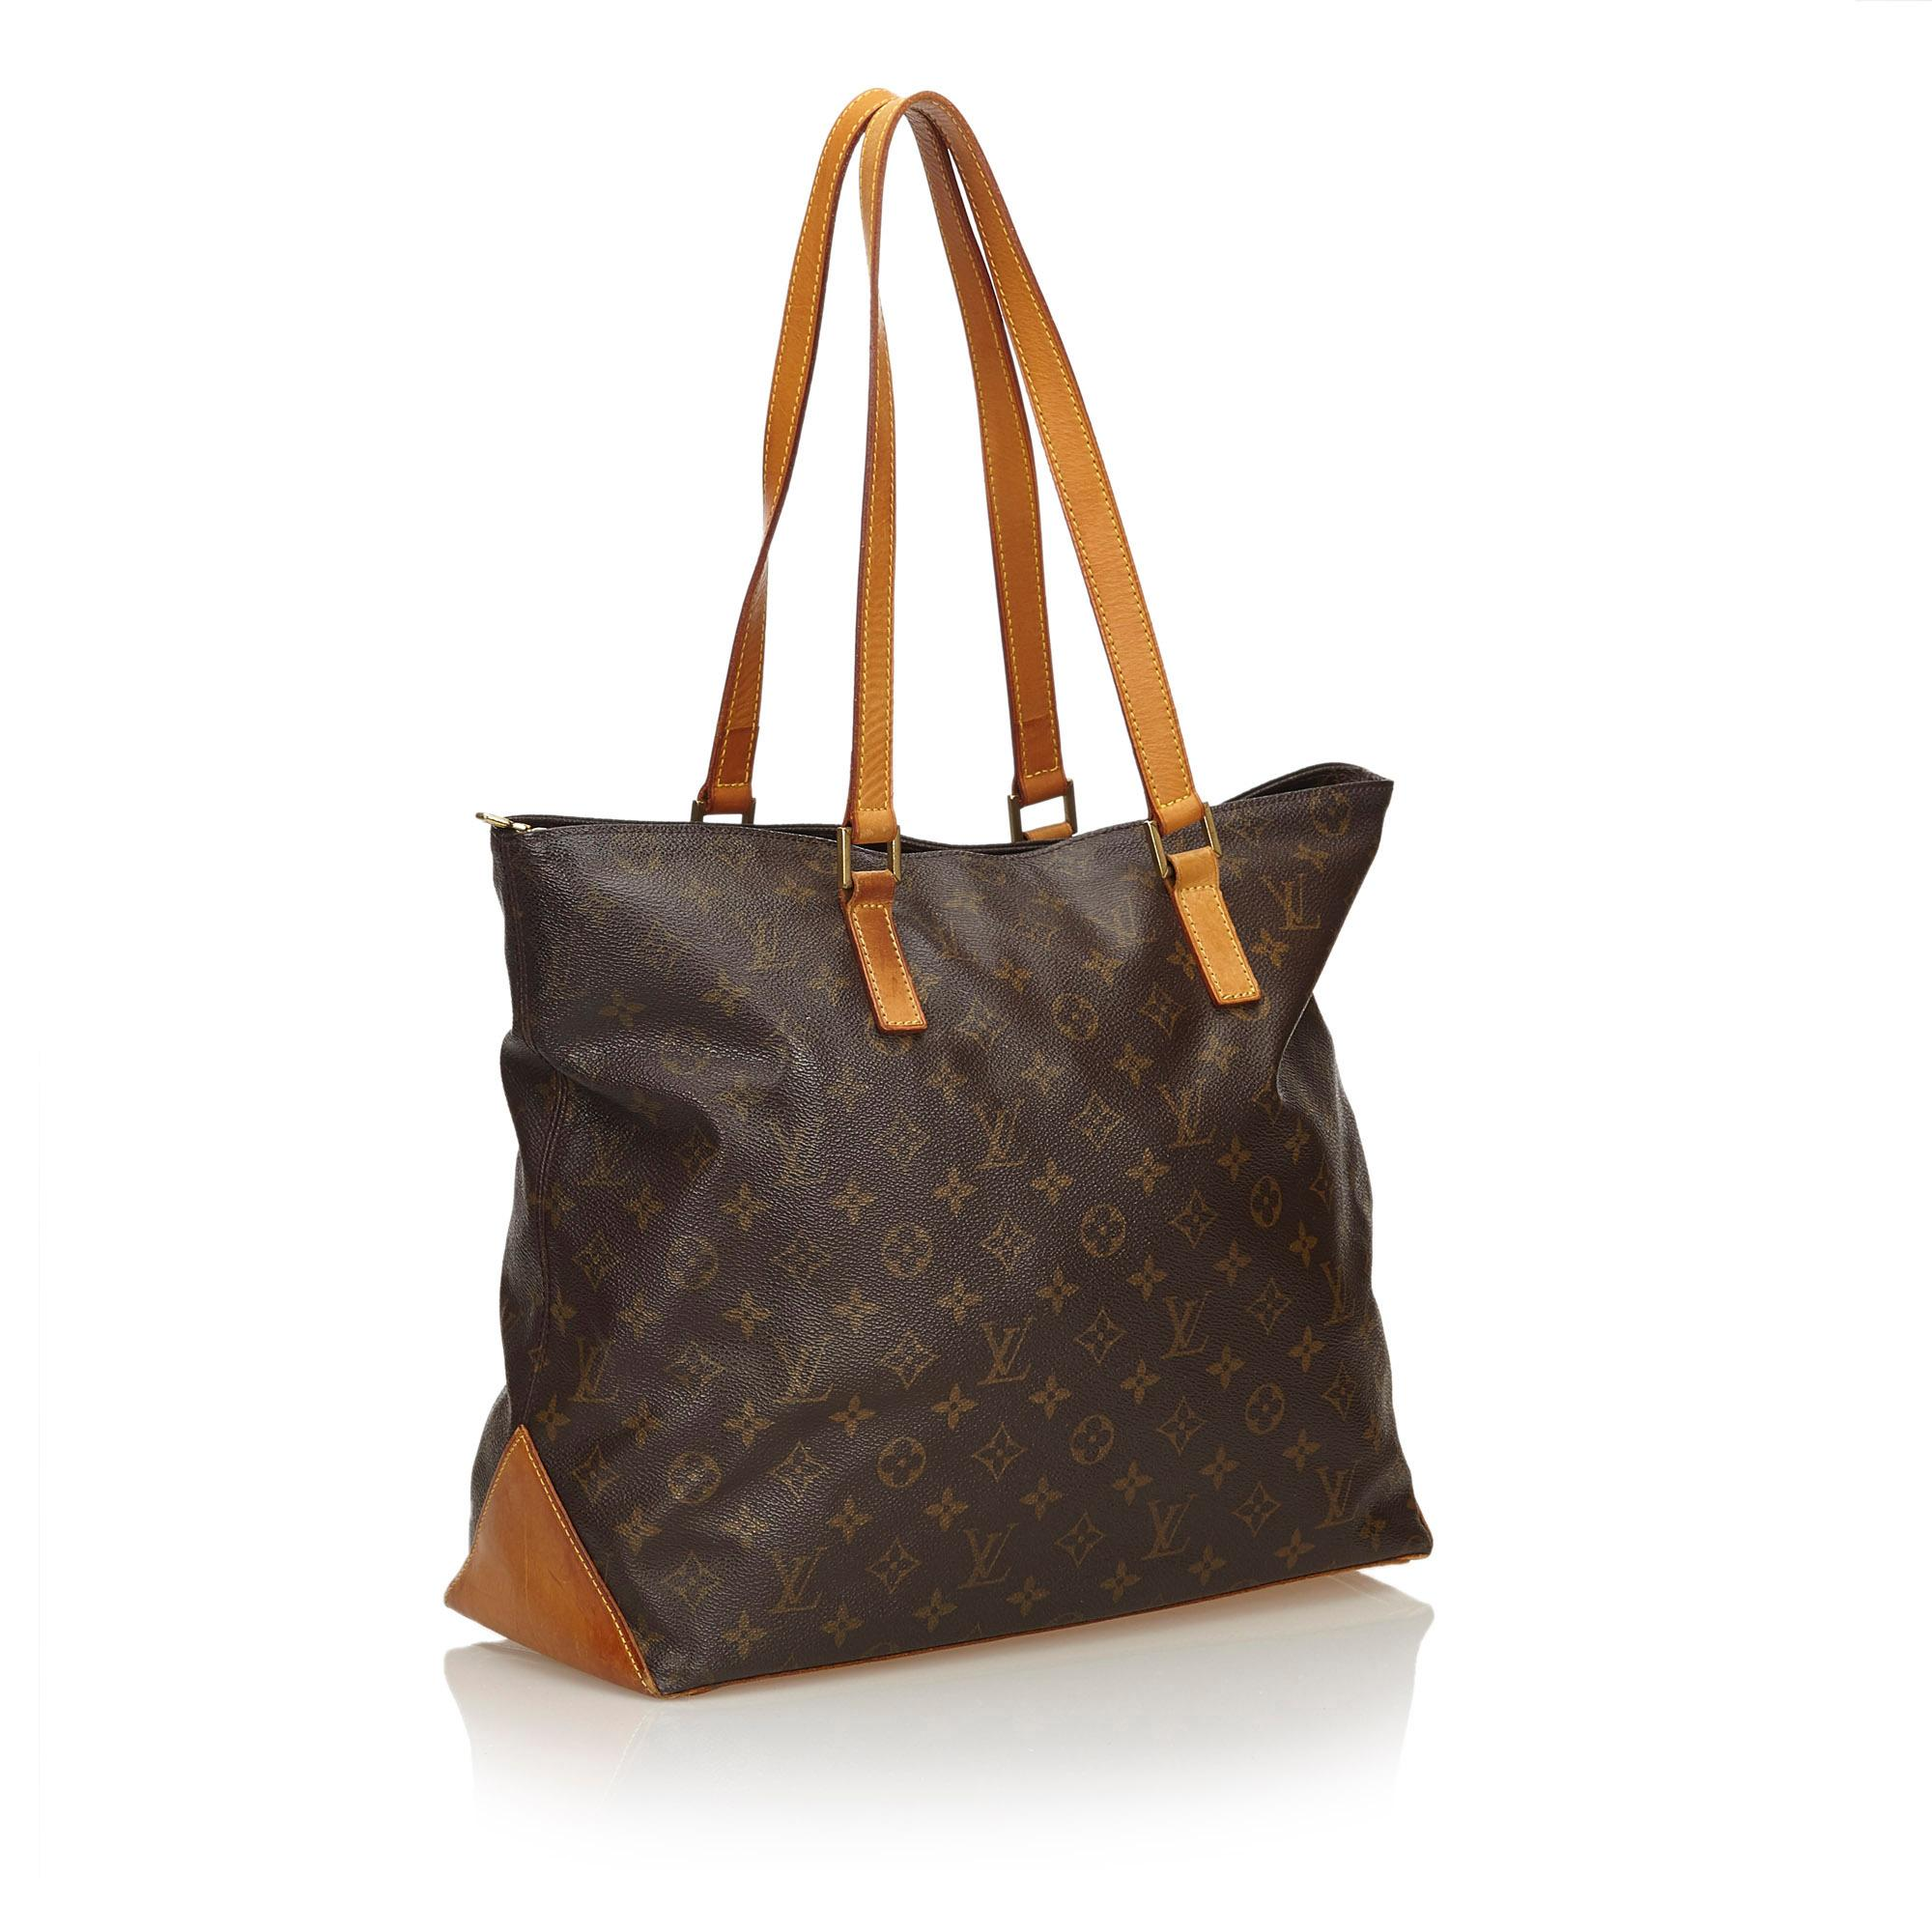 7eb729f6031 Louis Vuitton Brown Monogram Cabas Mezzo